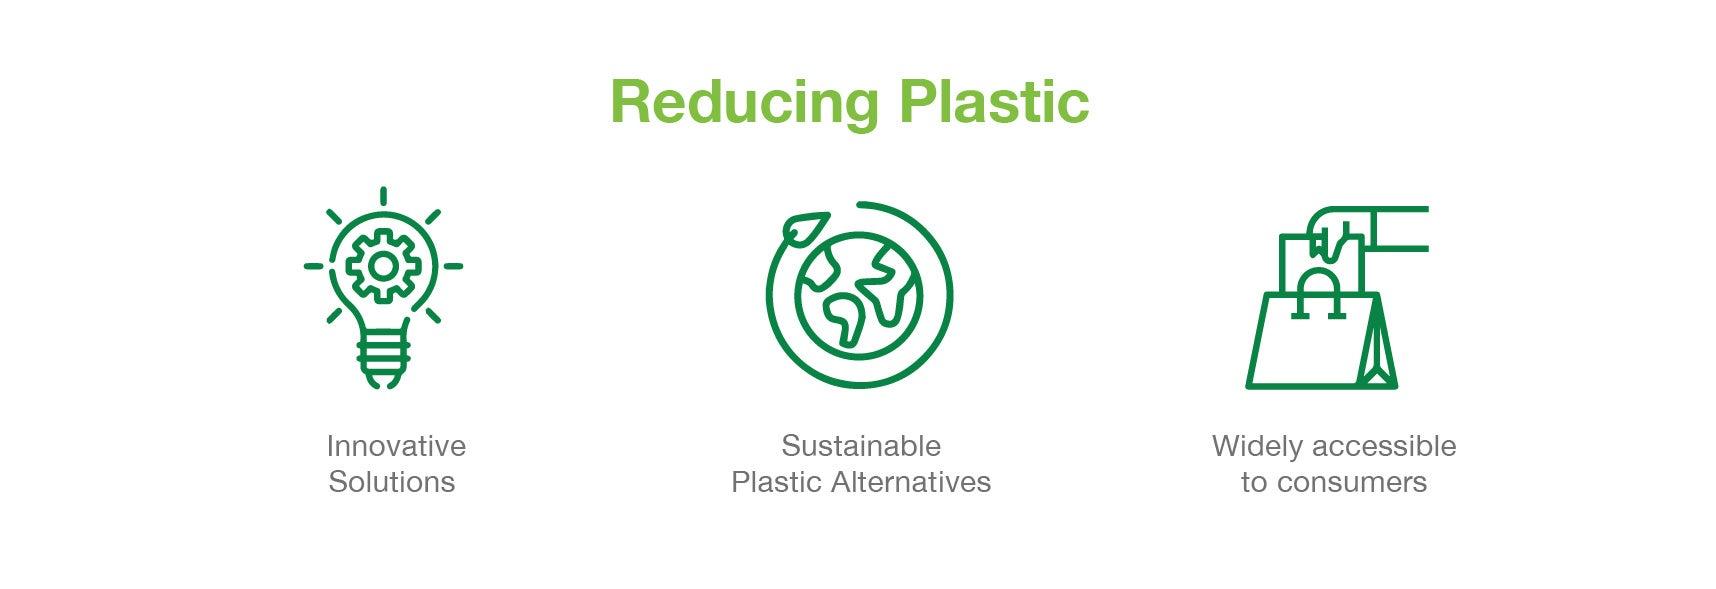 reducing-plastic-01.jpg